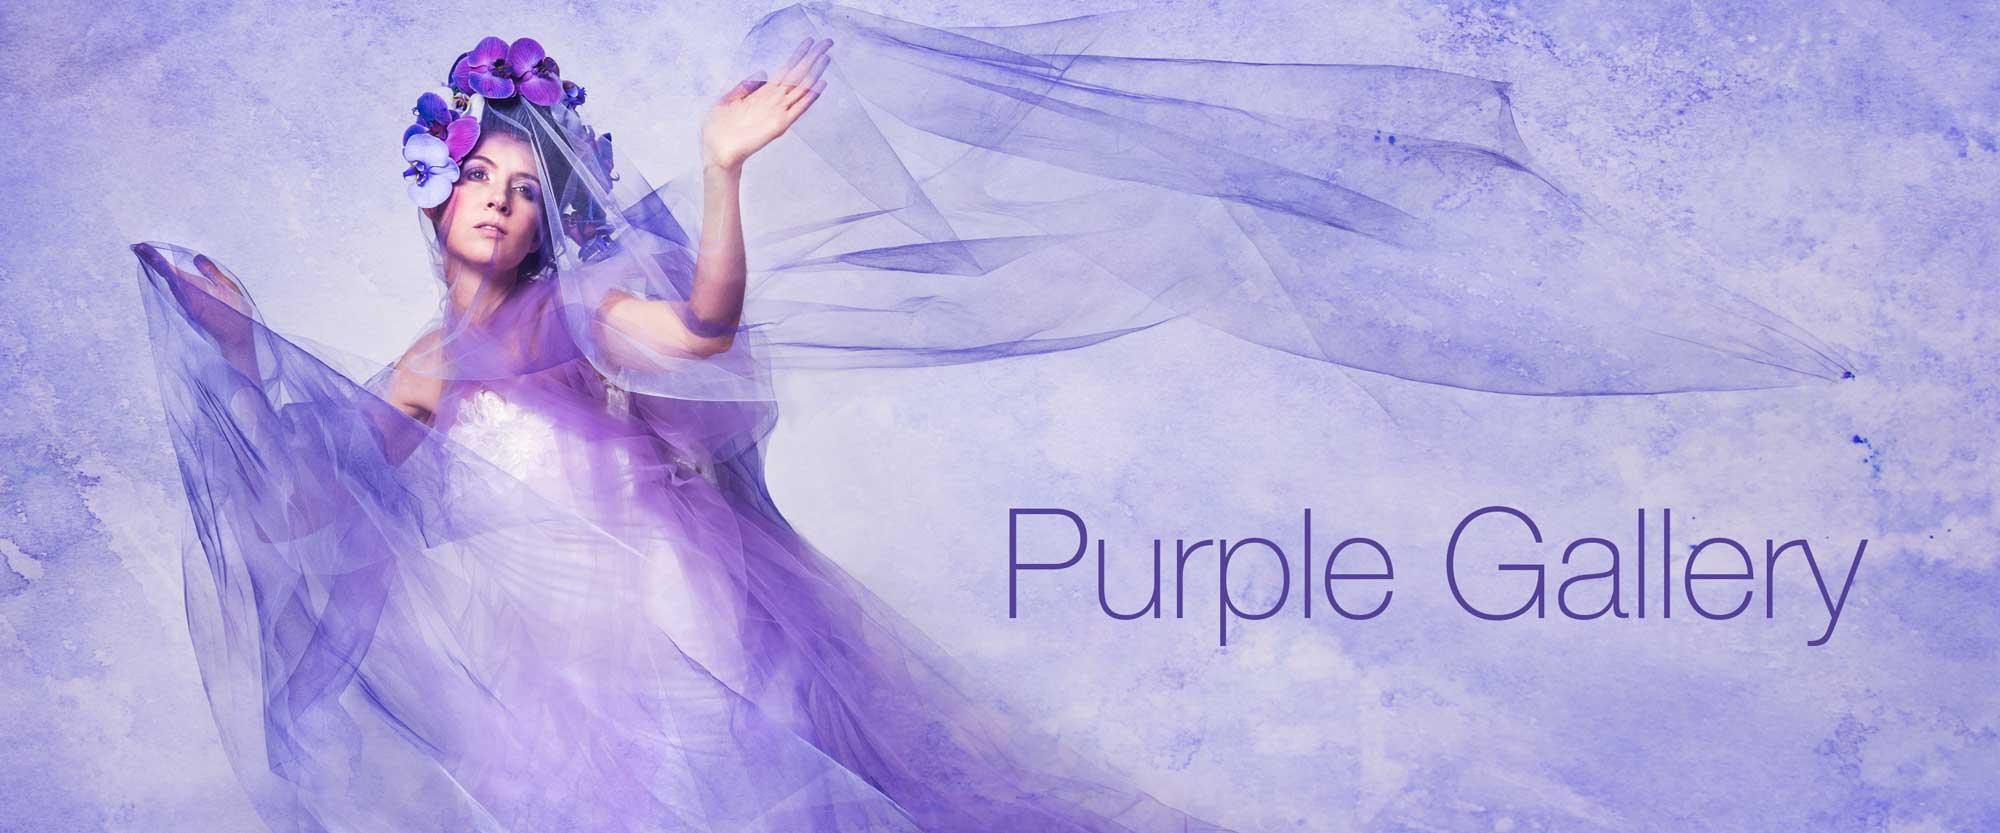 Laüra Hollick Purple Gallery